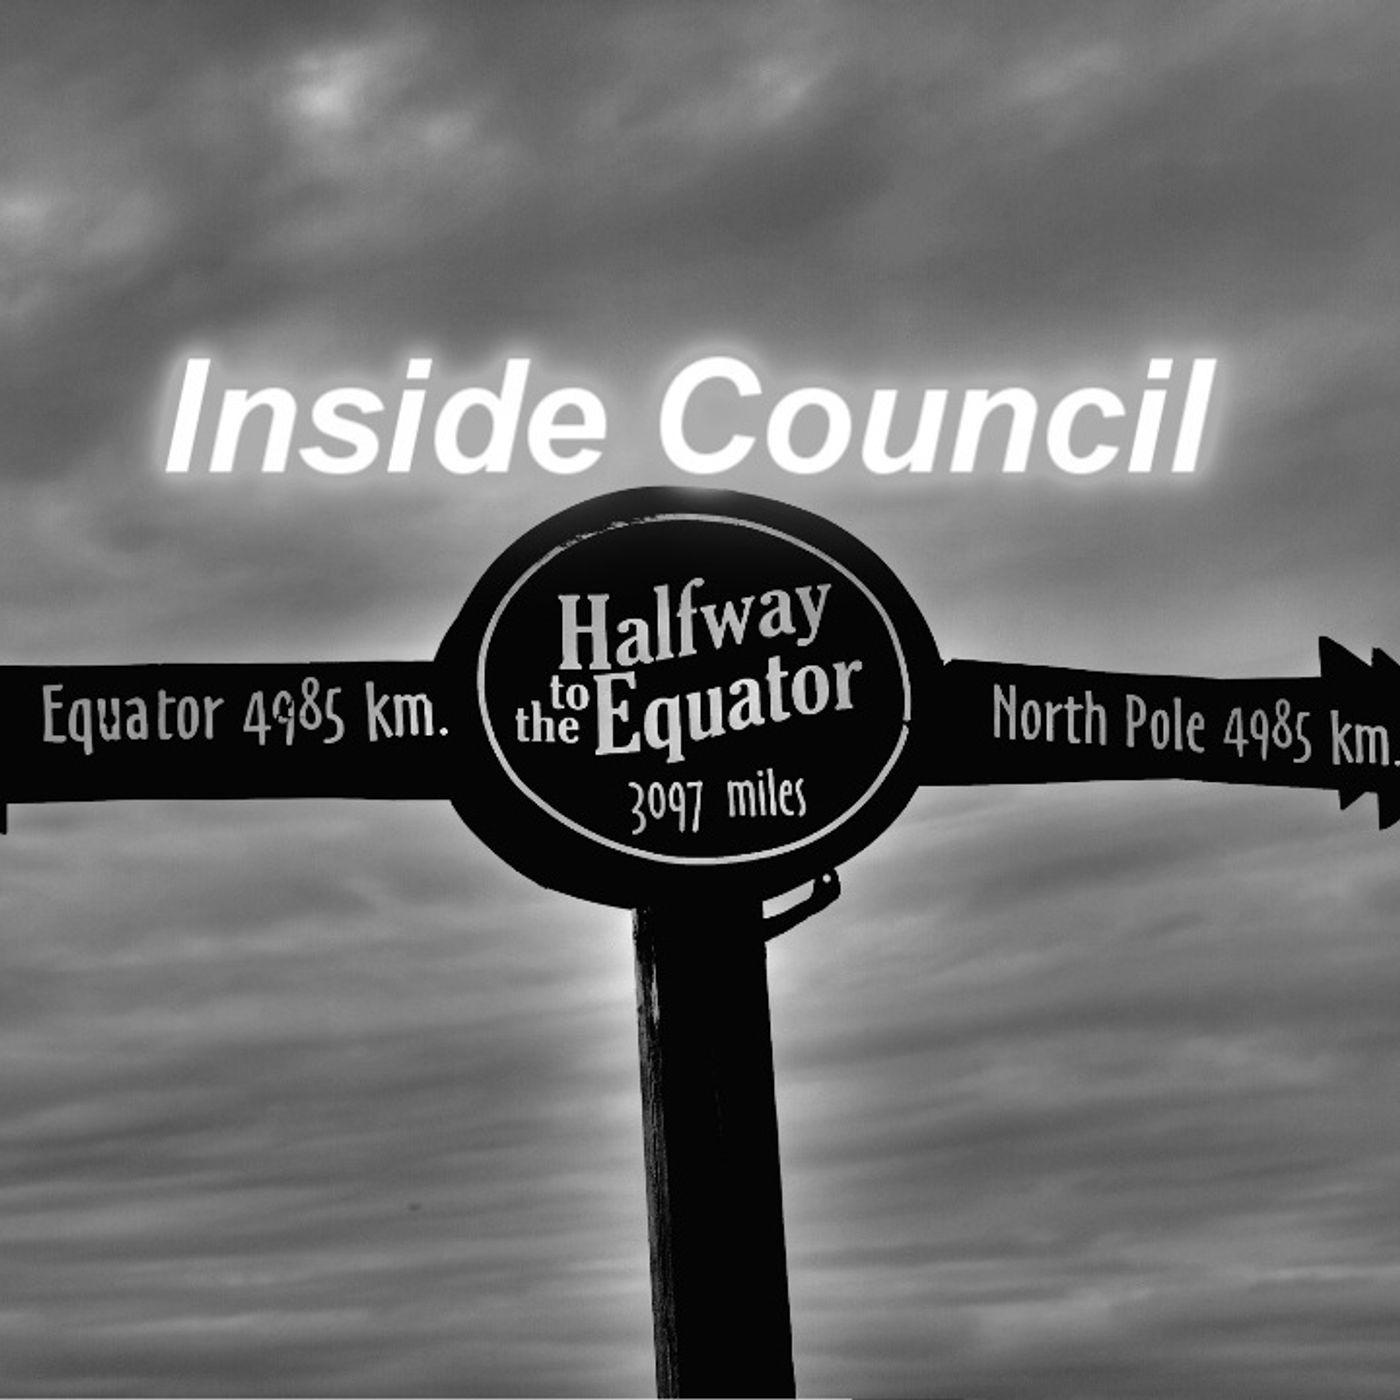 Inside Council